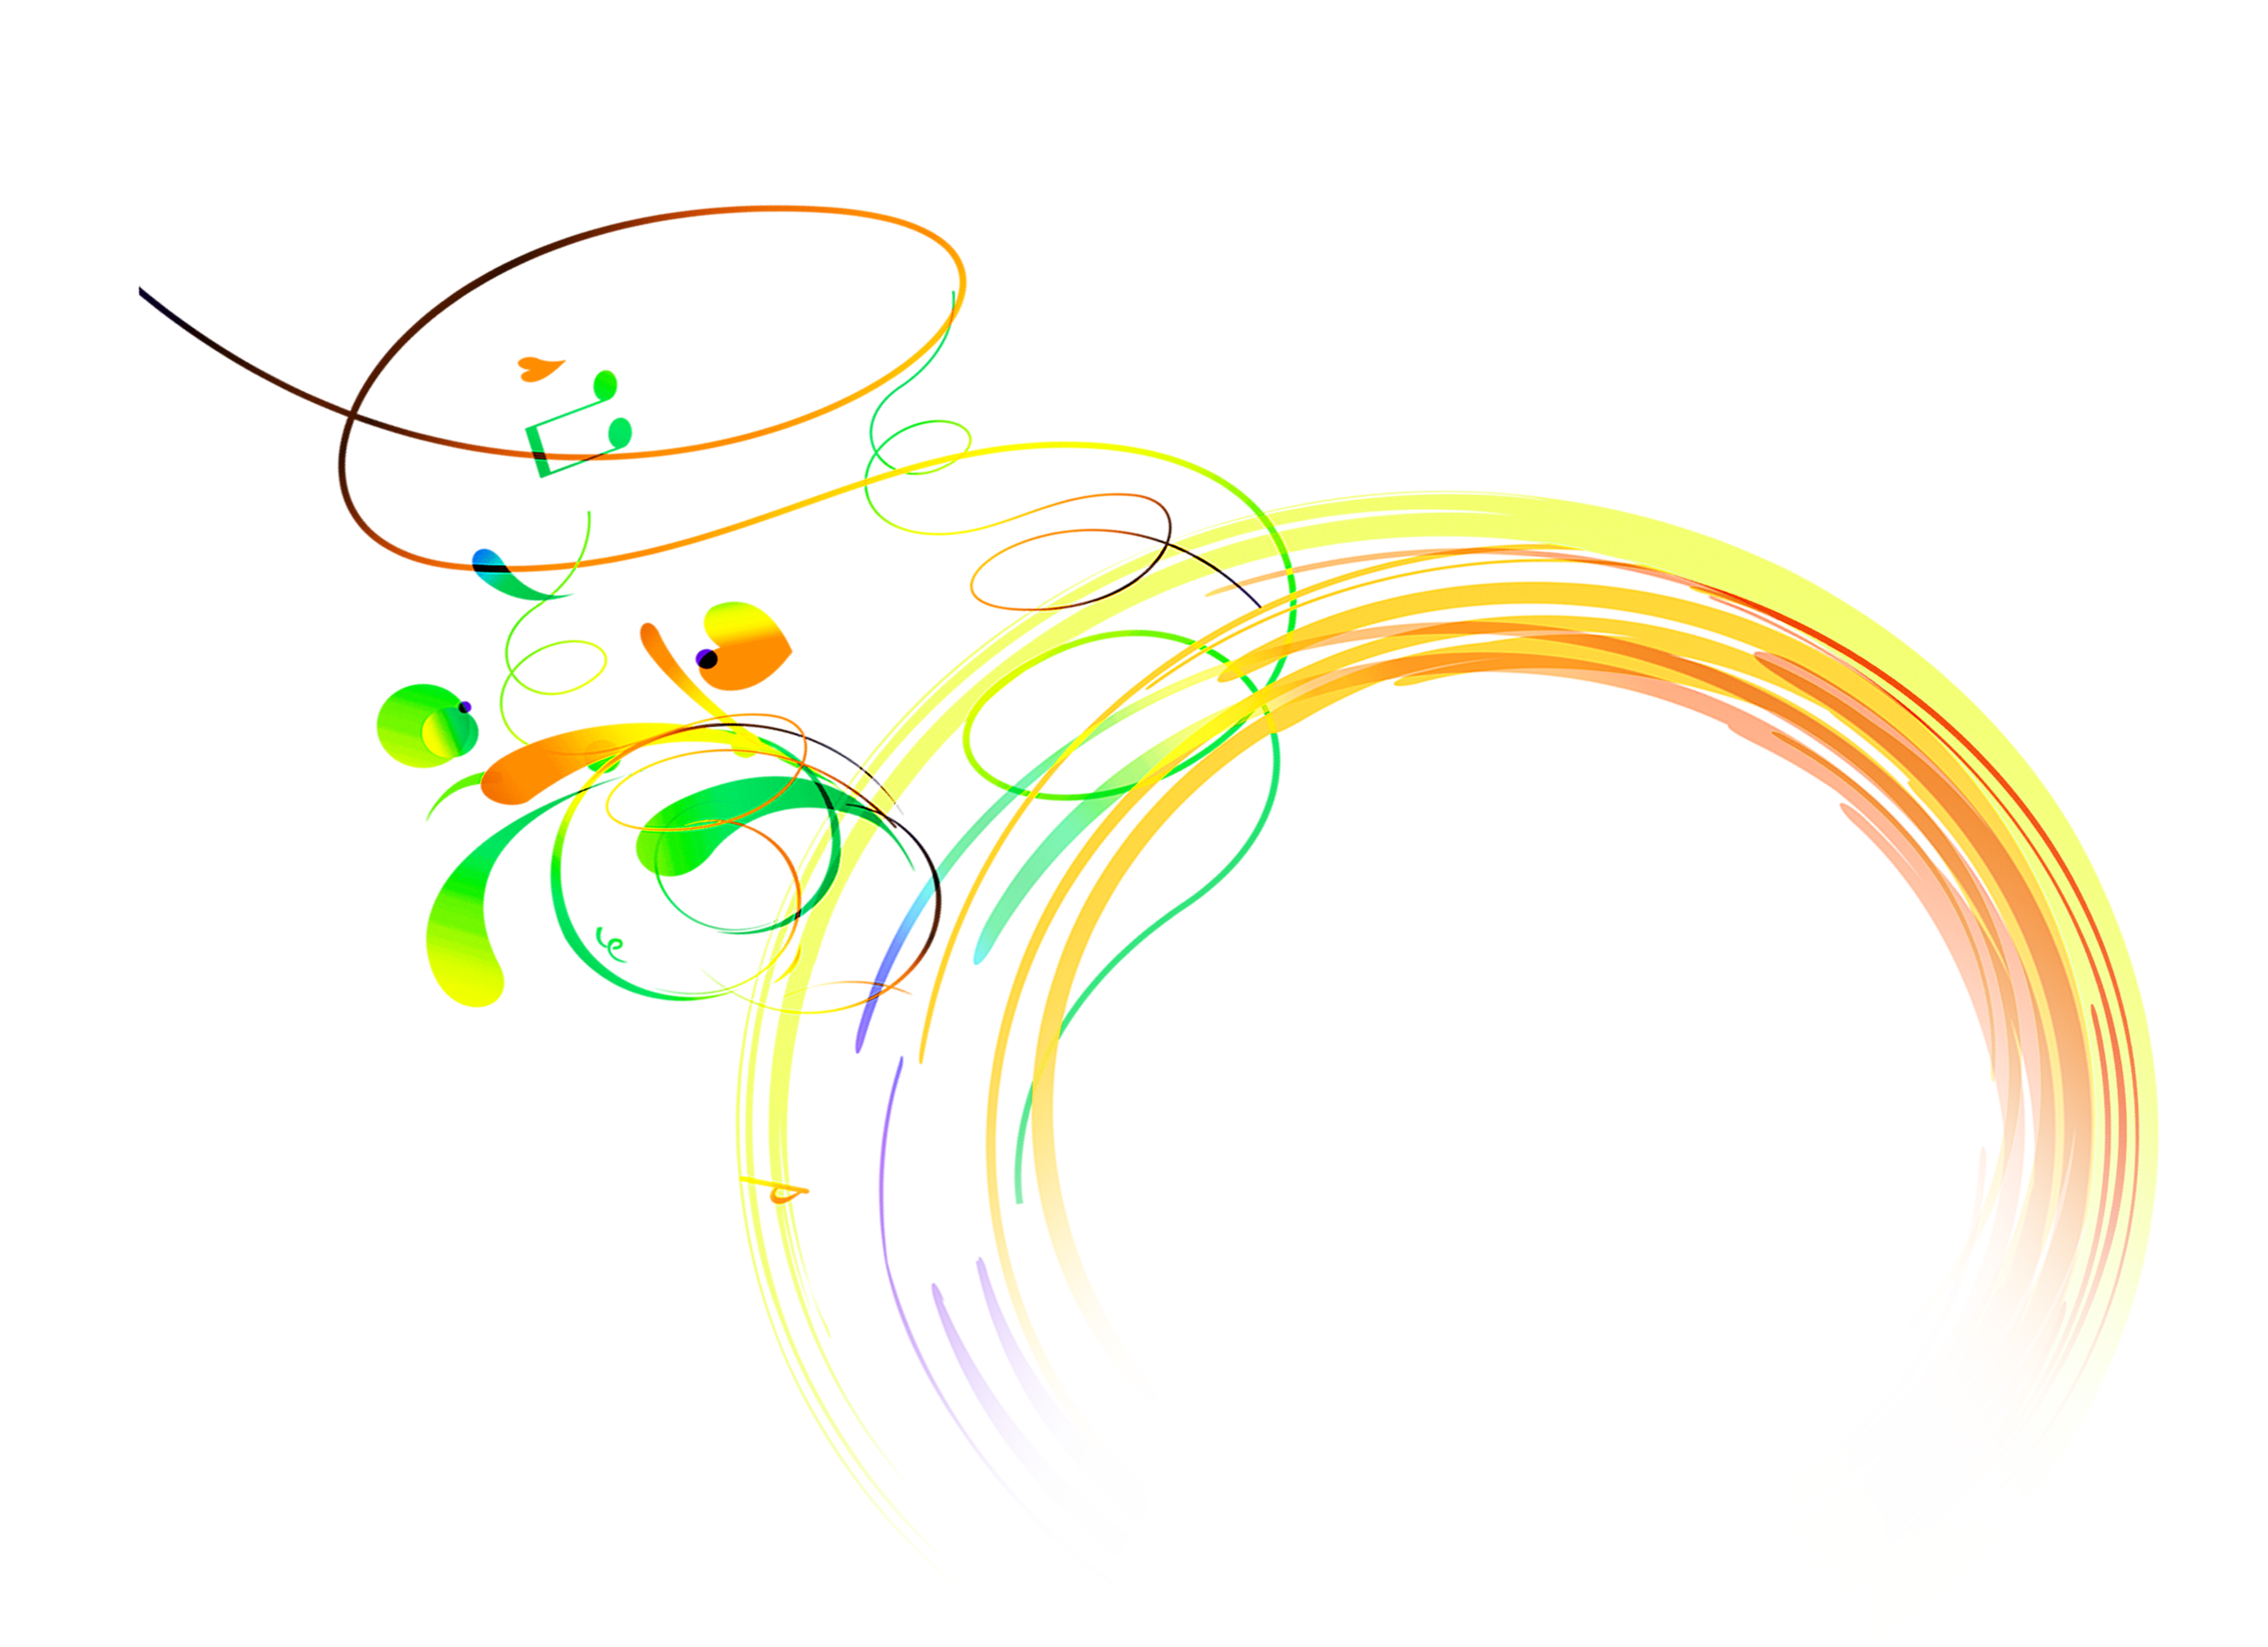 Graphic clip graphic free stock Graphic design Color Clip art - Colorful background 3595*2610 ... graphic free stock